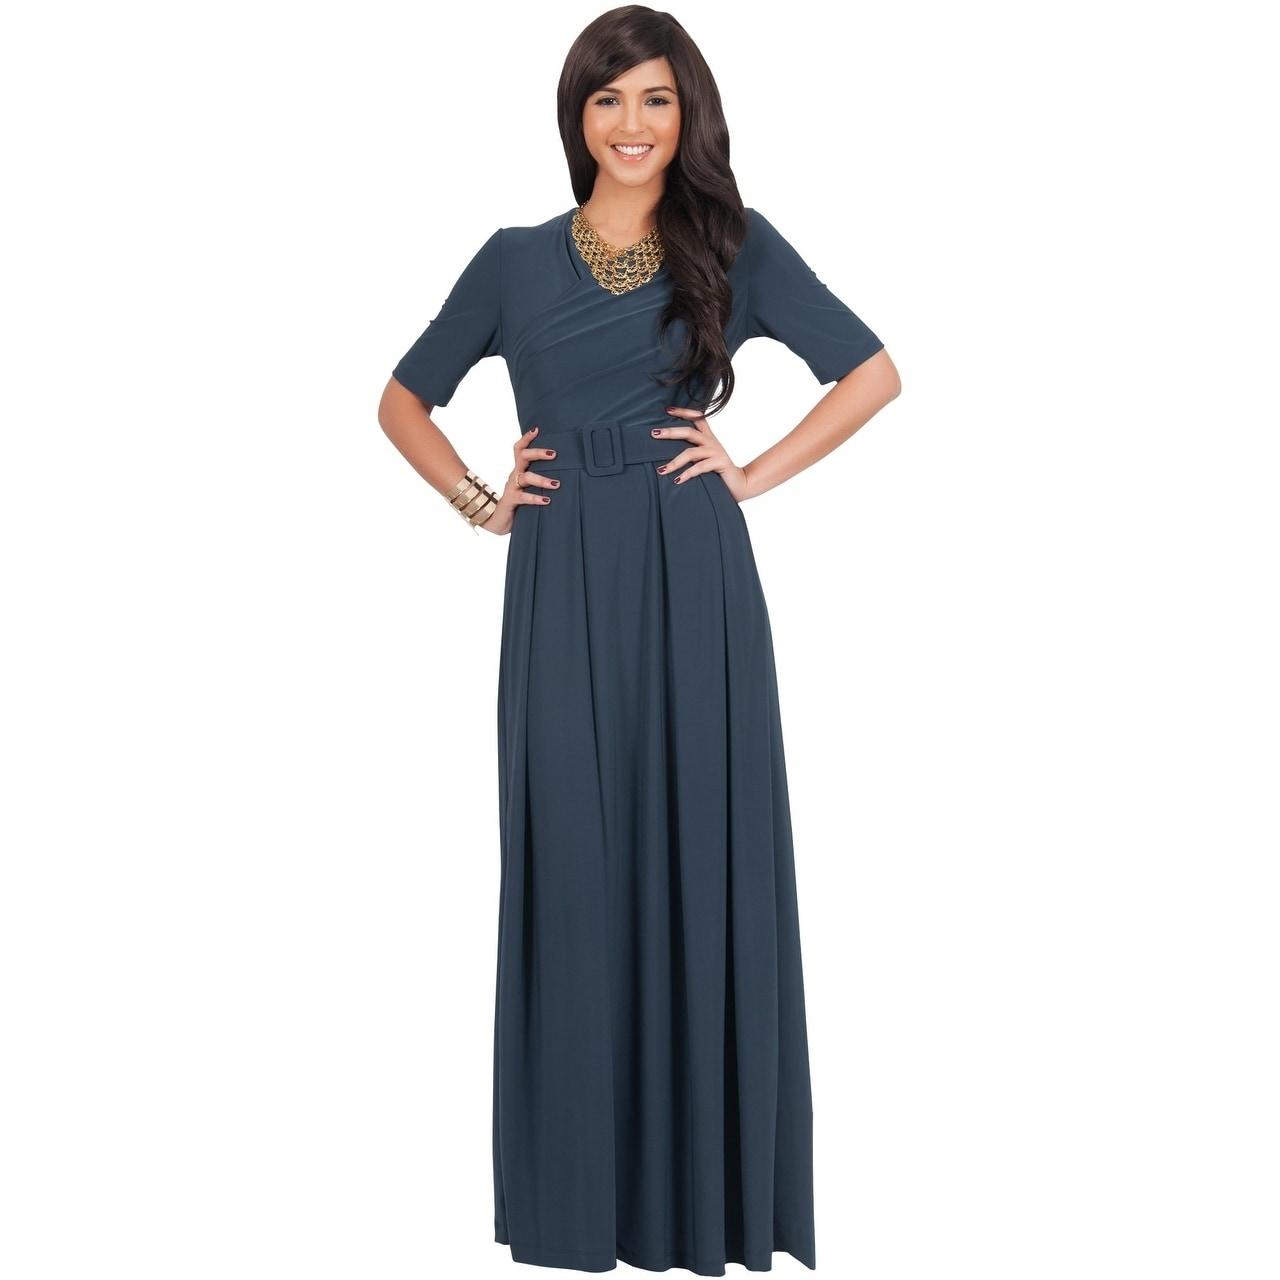 be99ab31dd2cbb Long Sleeve Maxi Dress Extra Length